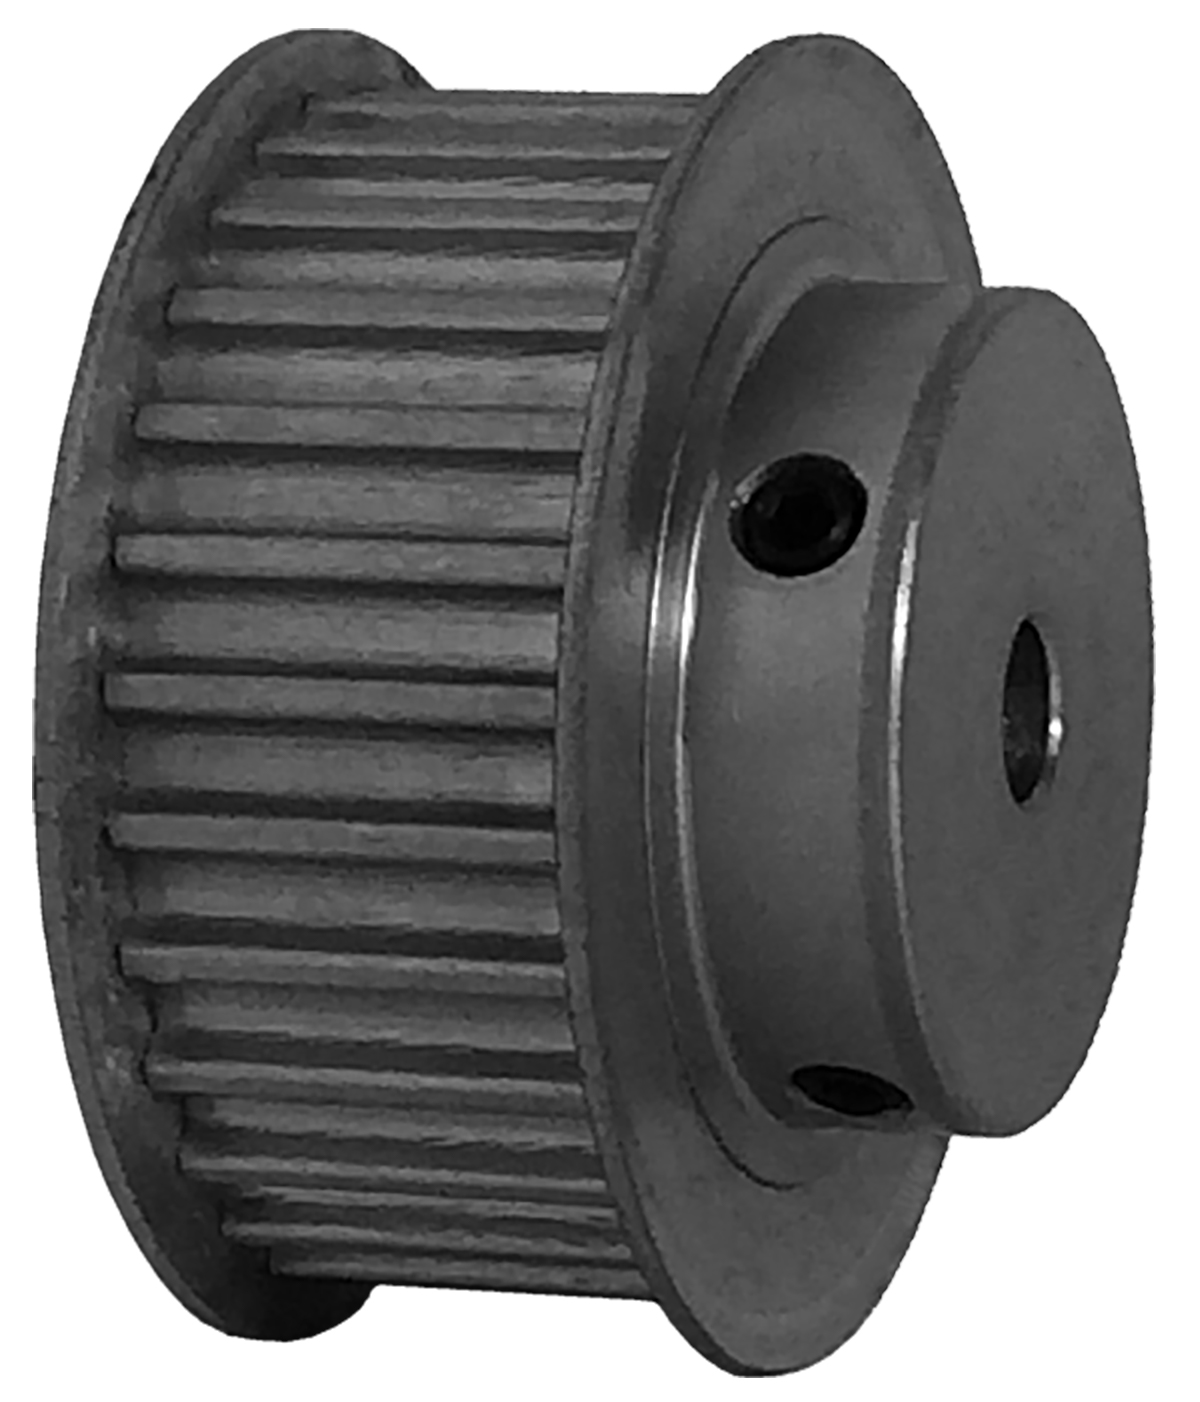 28-5M15-6FA3 - Aluminum Powerhouse®HTD® Pulleys